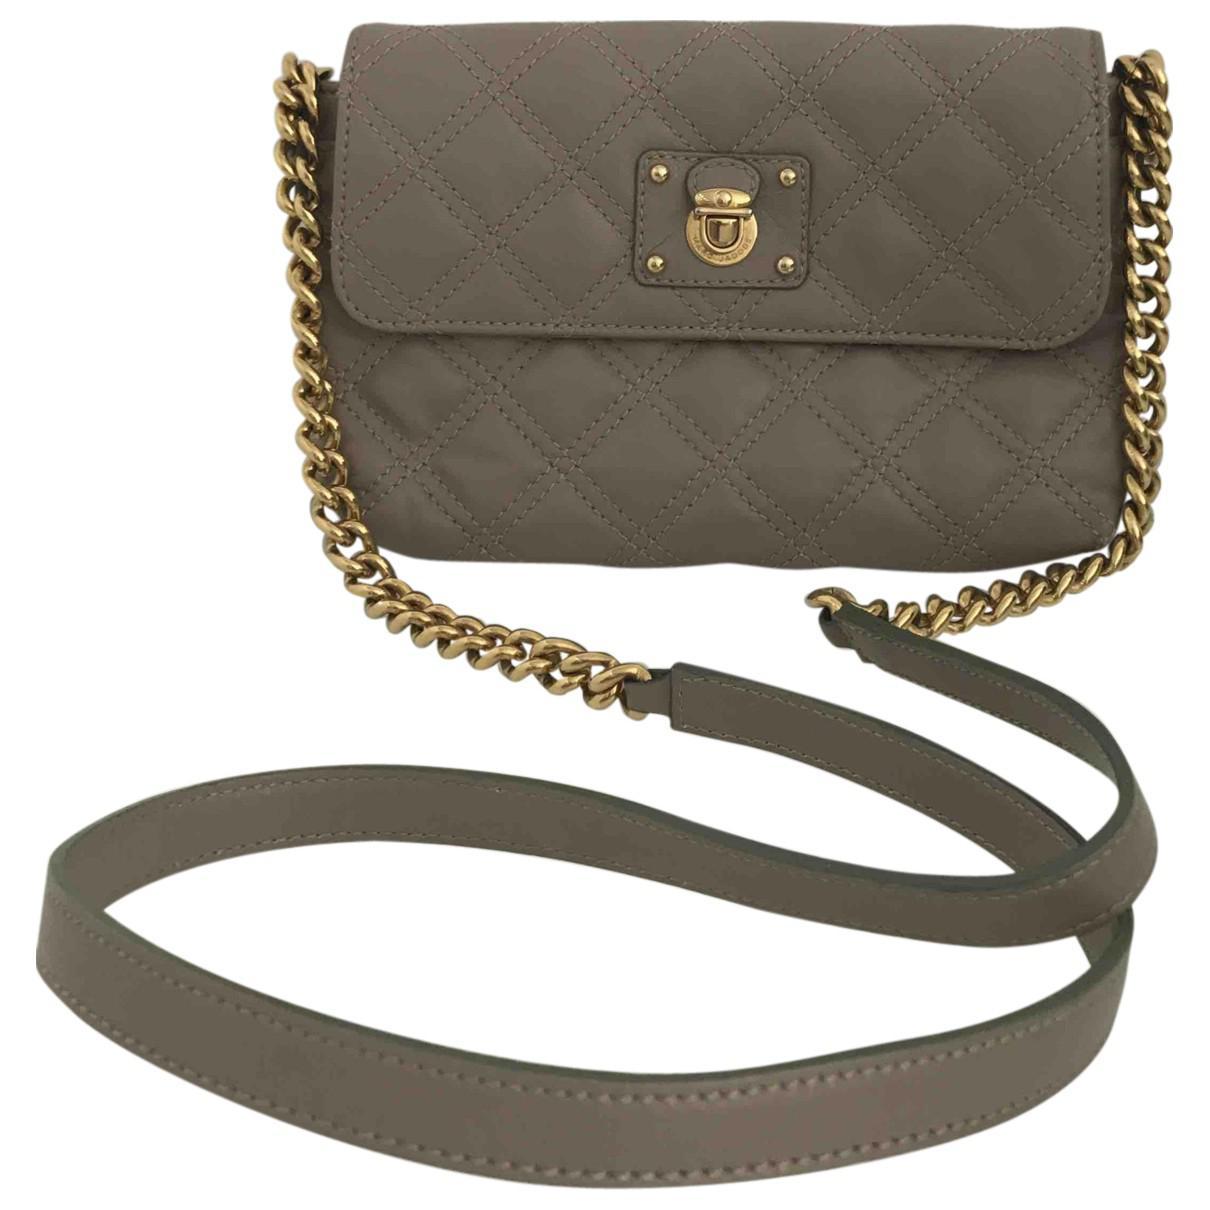 Pre-owned - Crossbody bag Marc Jacobs spNwEud6j